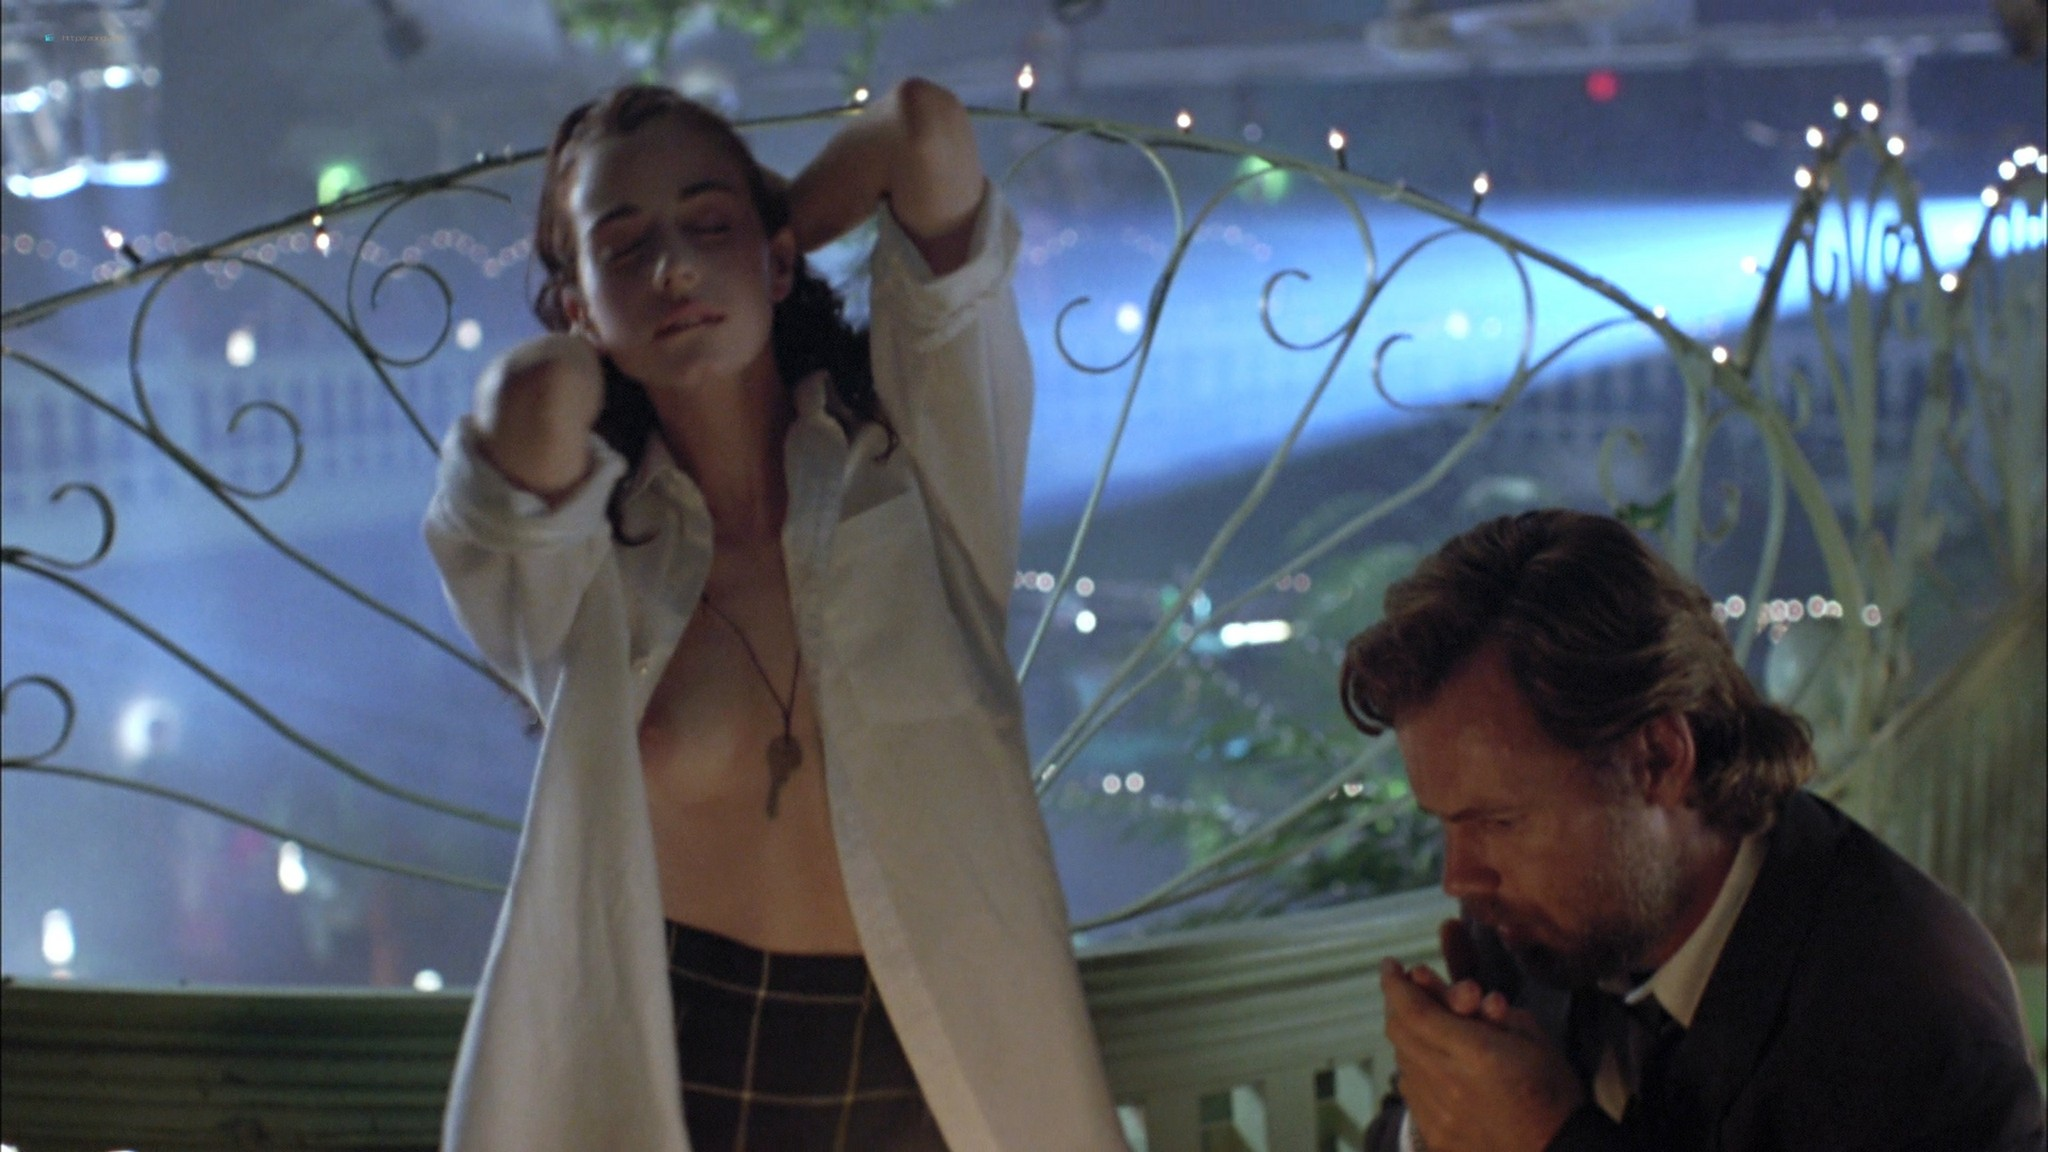 Mia Kirshner nude Arsinée Khanjian sexy - Exotica (1994) HD 1080p BluRay REMUX (10)